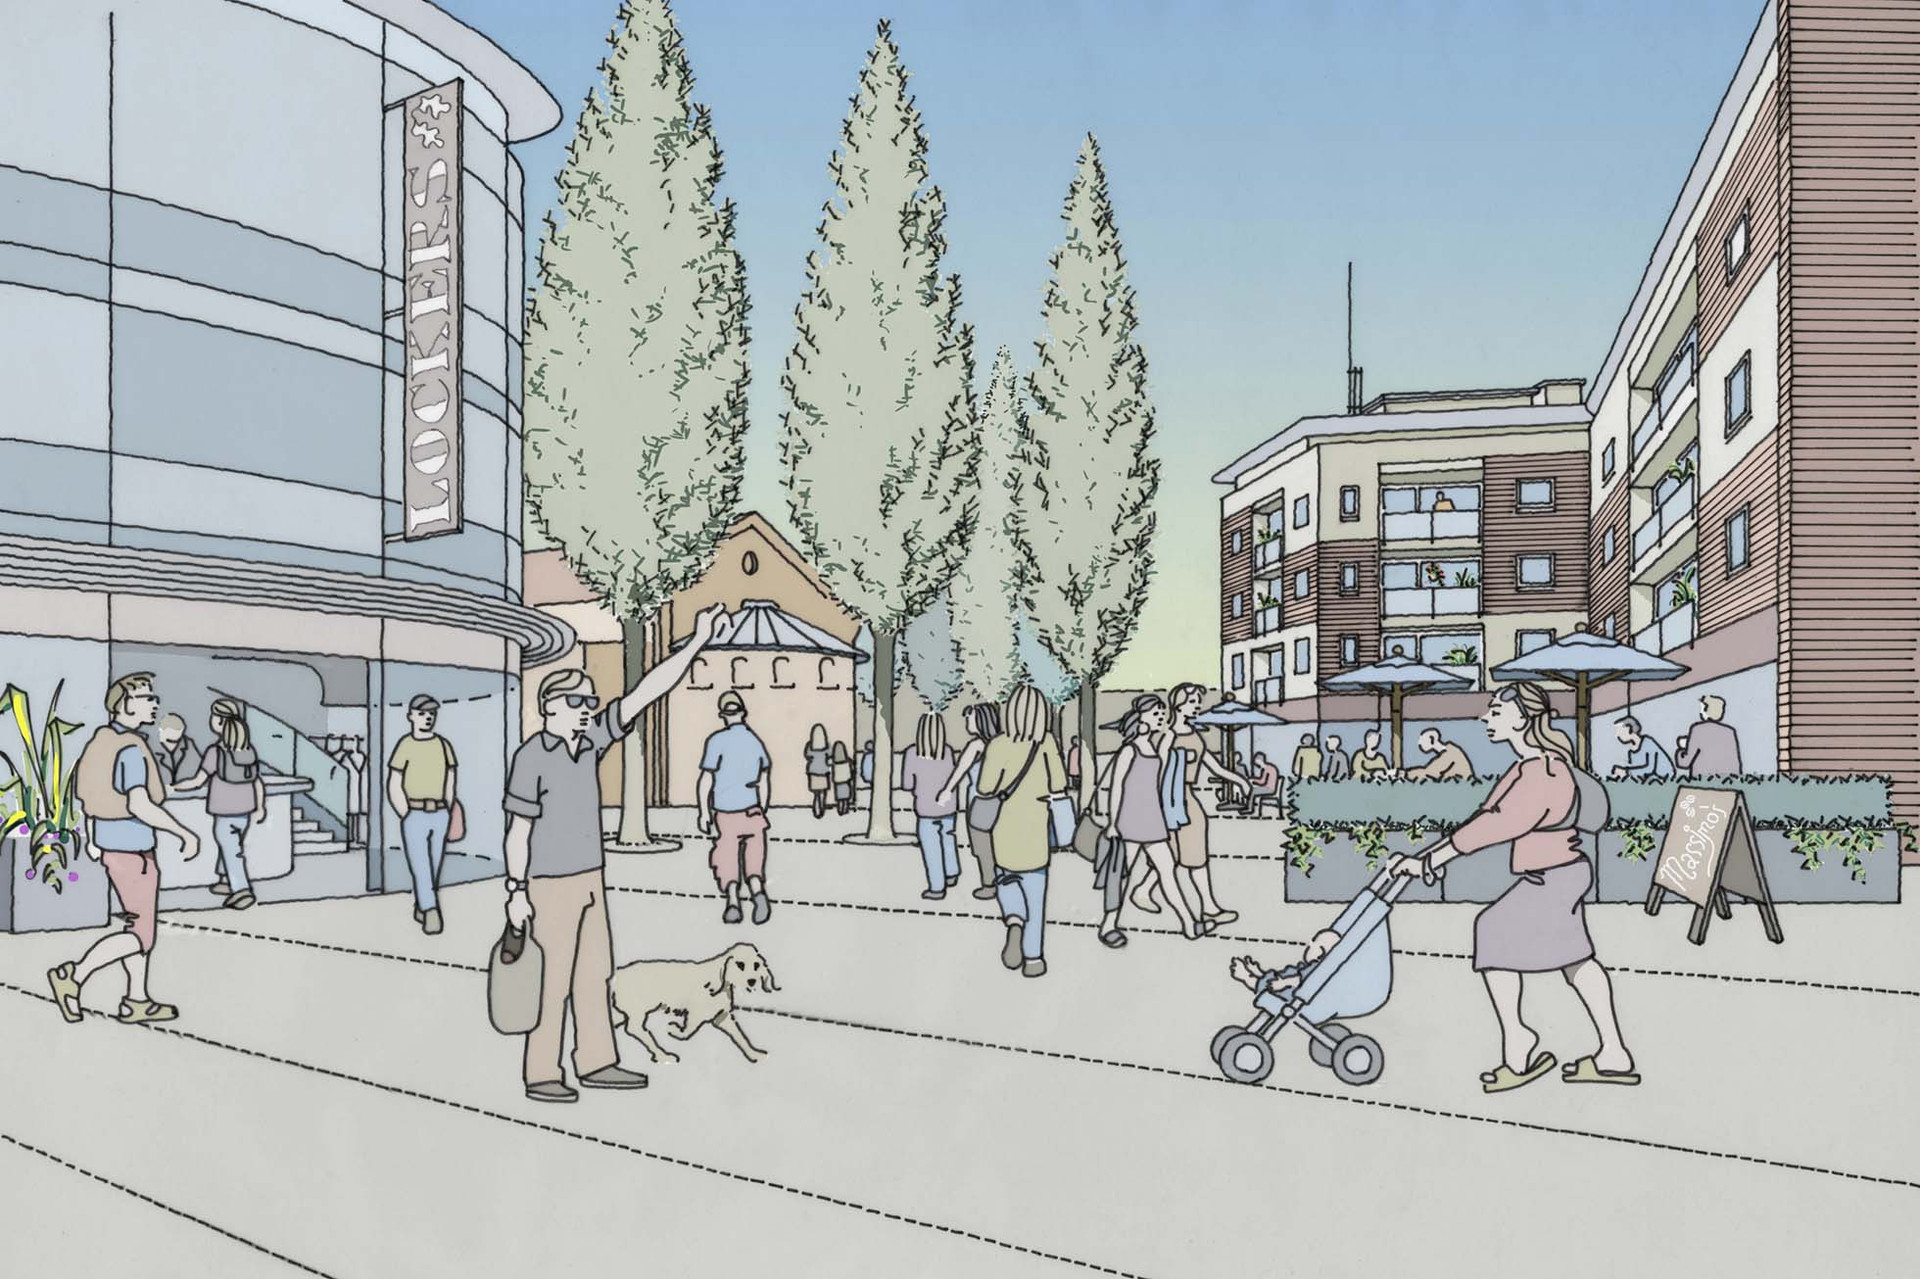 Proposed shopping precinct illustration